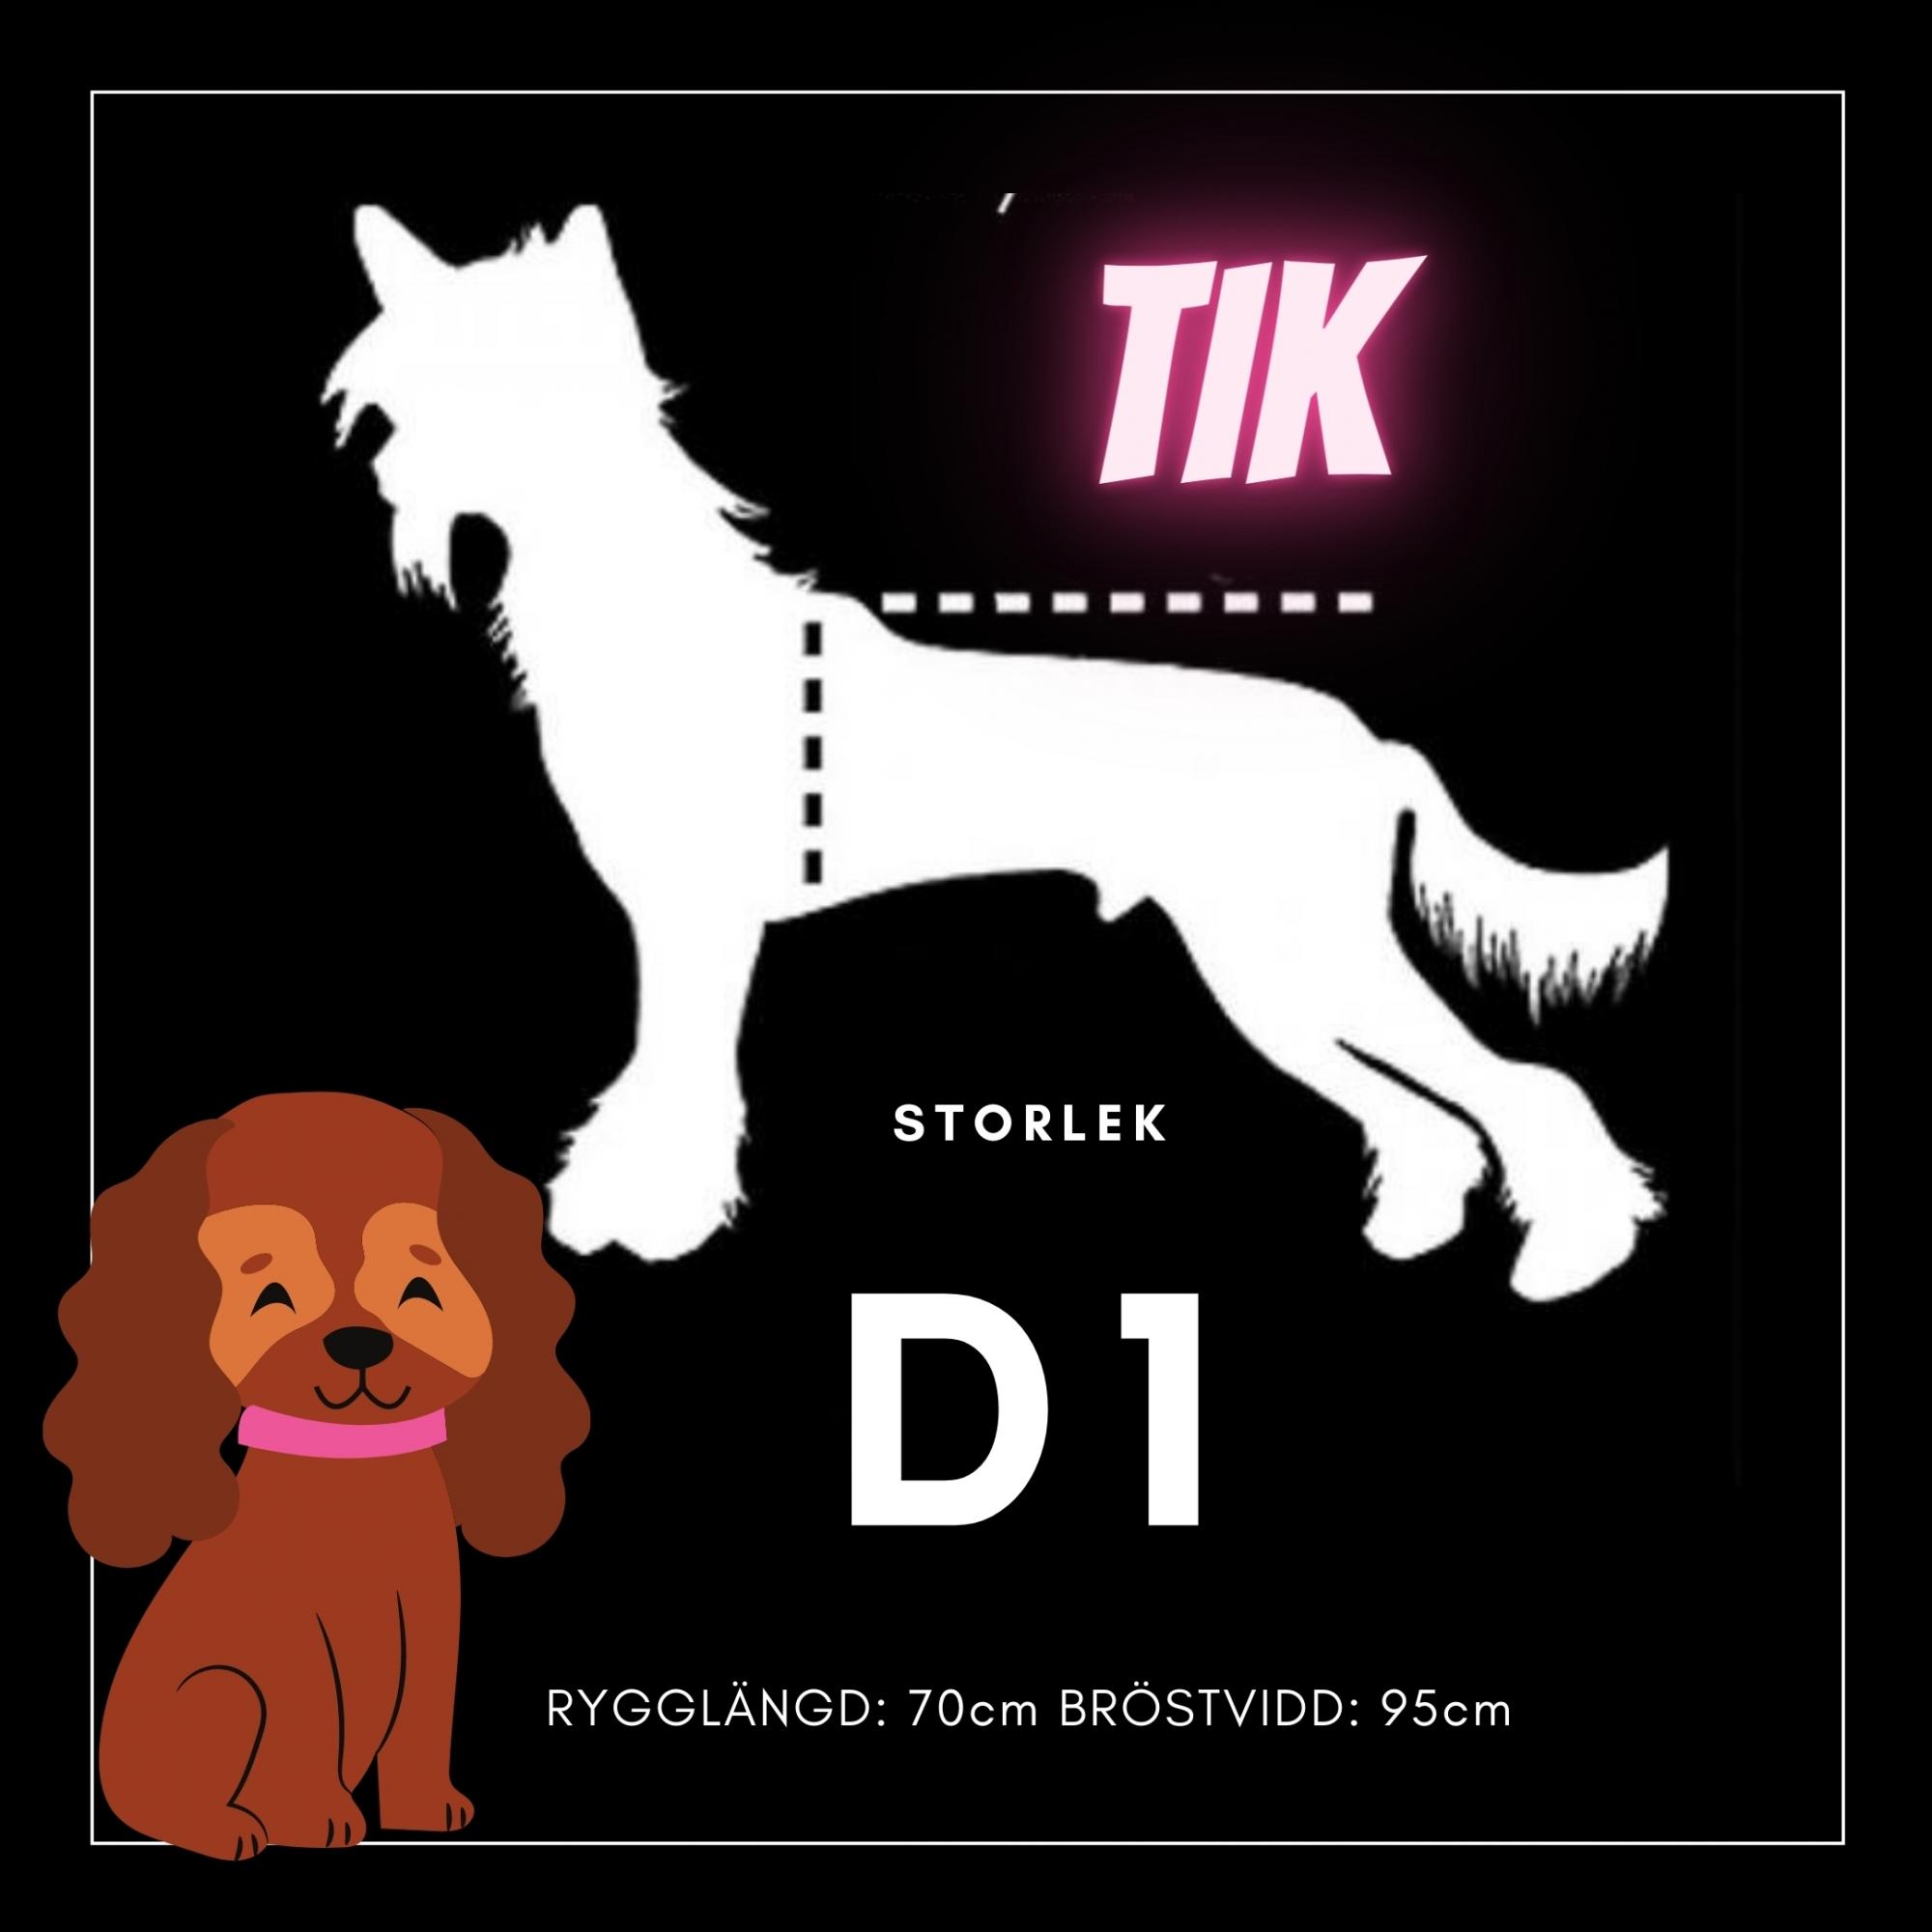 Tik Storlek D1 - Passion For Pet Fashion